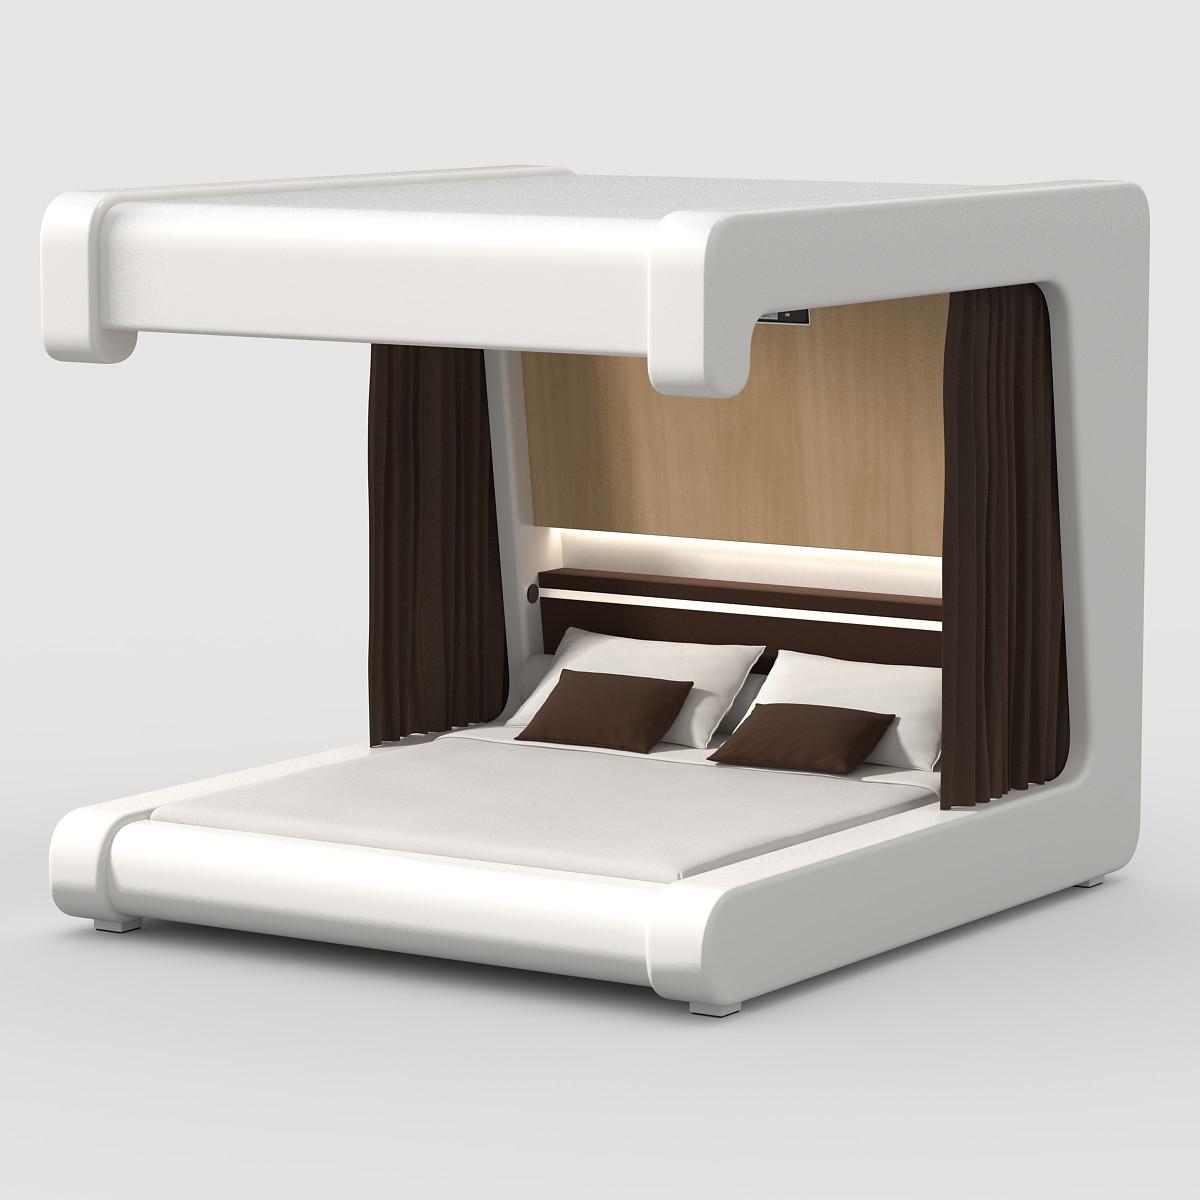 Somnus-Neu Bed